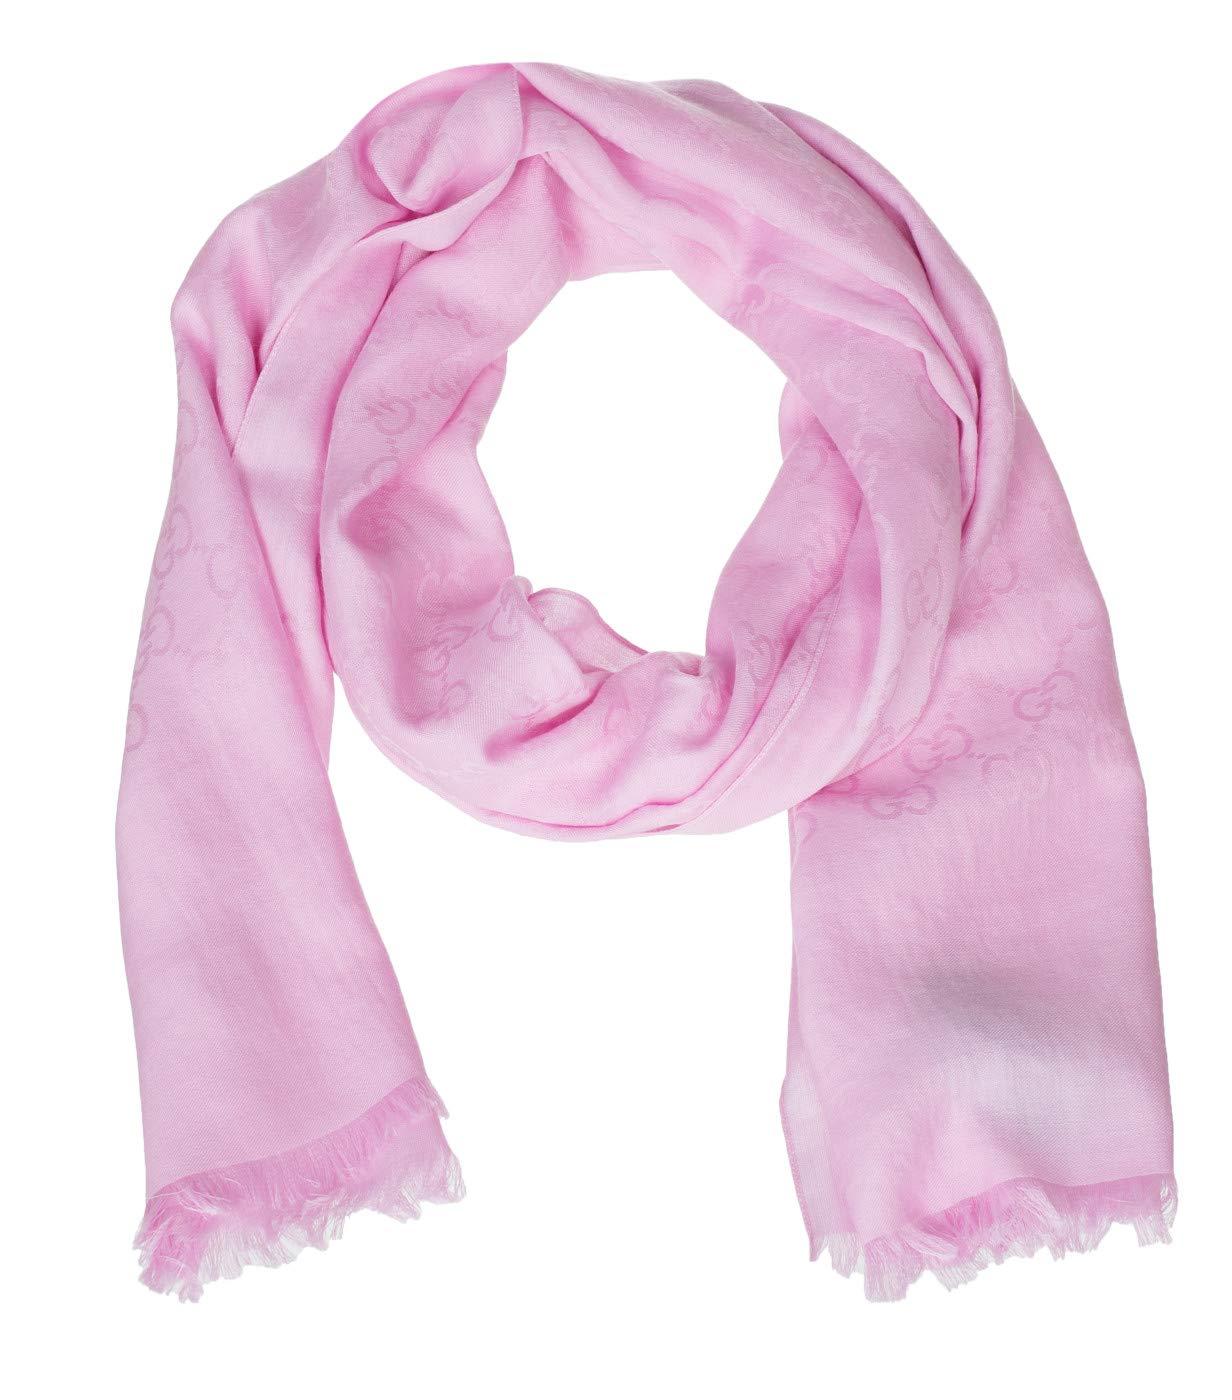 Gucci Women's Pink Wool Silk GG Guccissima Shawl Scarf